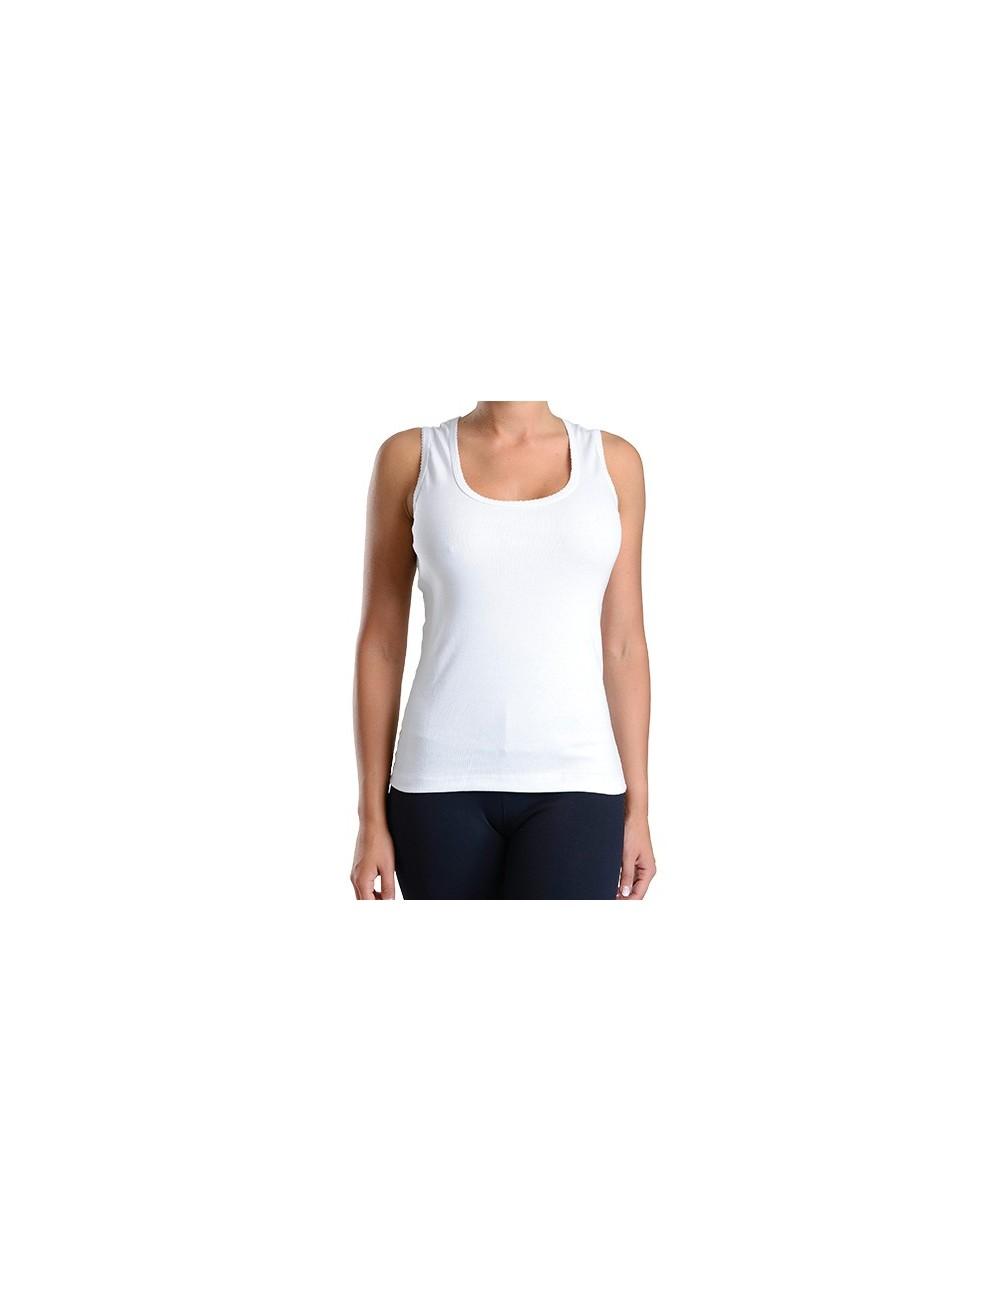 19ab29737501 Camiseta Sin Mangas Picueta Mujer.